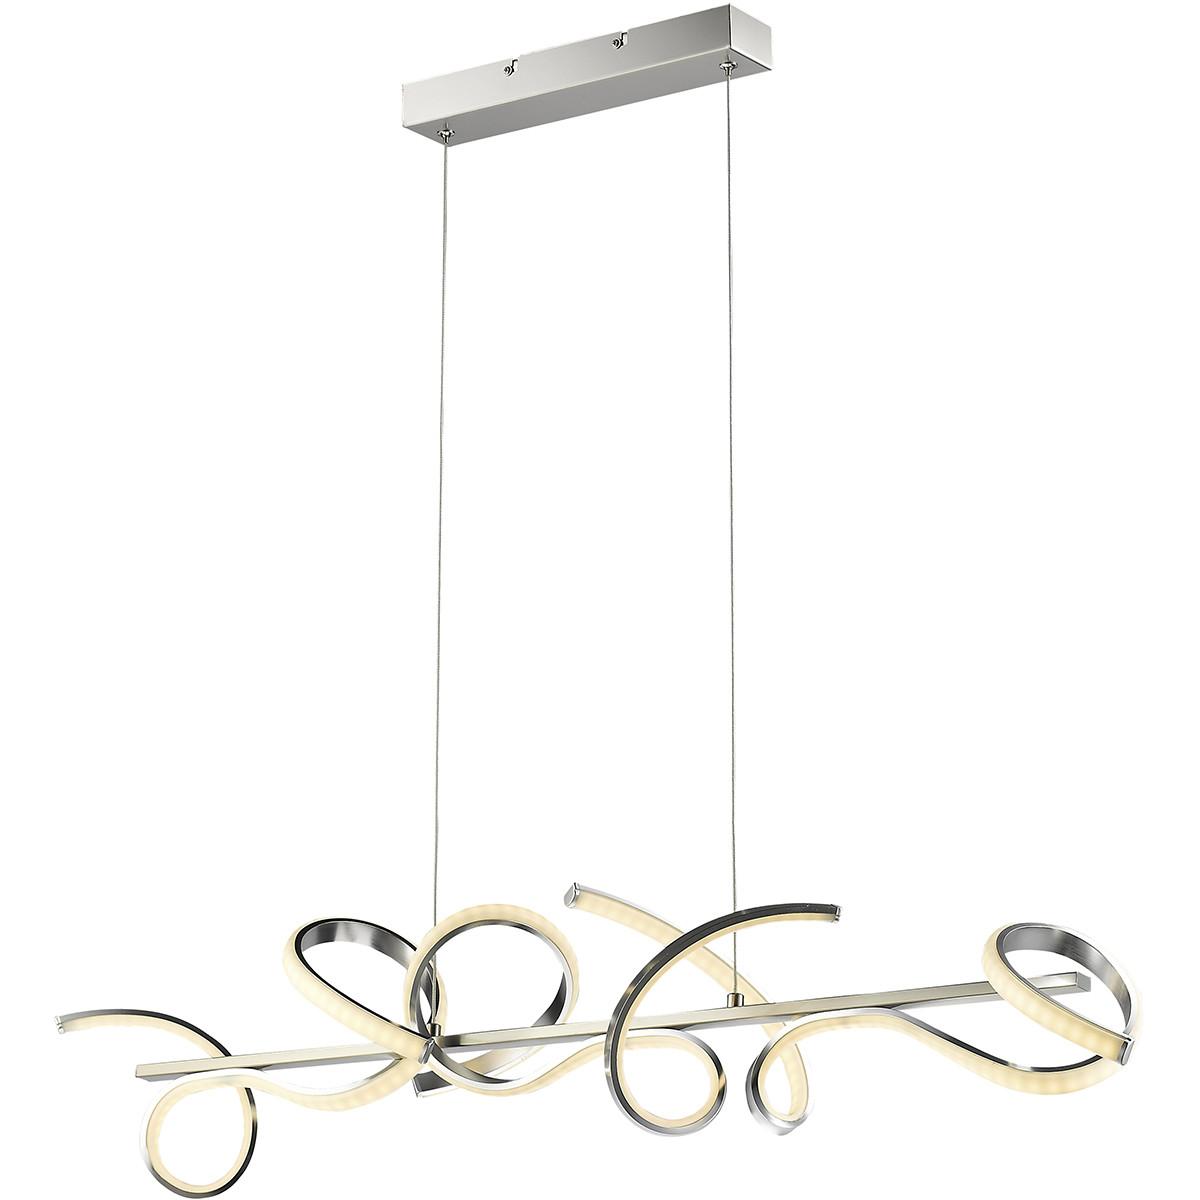 LED Hanglamp - Trion Mestino - 20W - Warm Wit 3000K - Dimbaar - Rechthoek - Mat Nikkel - Aluminium